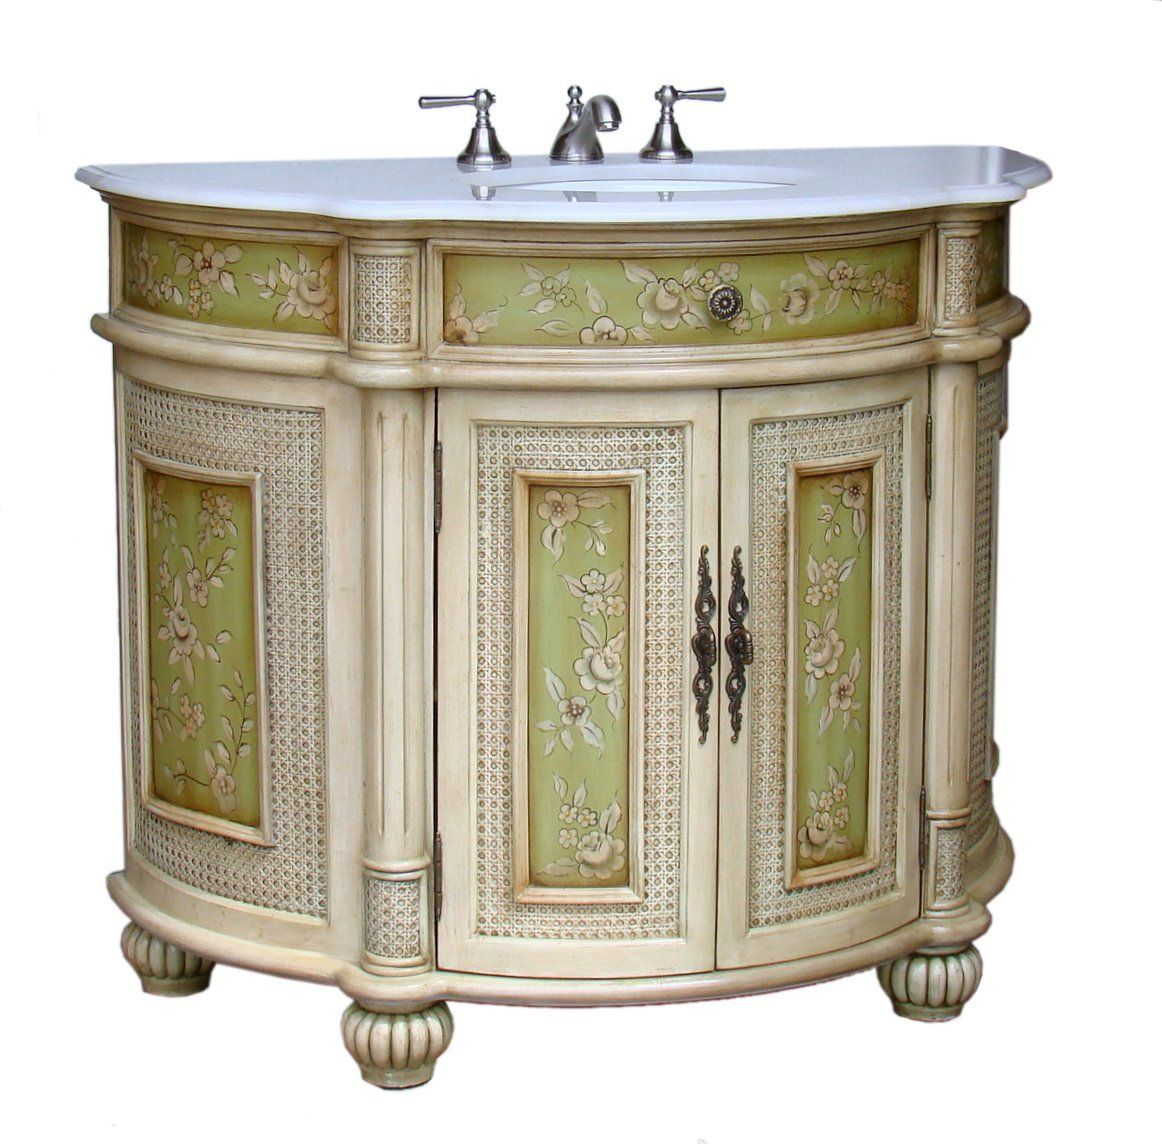 41 Inch Adelina Antique Hand Painted Bathroom Vanity Painted Vanity Bathroom Floral Bathroom Painted Bathroom